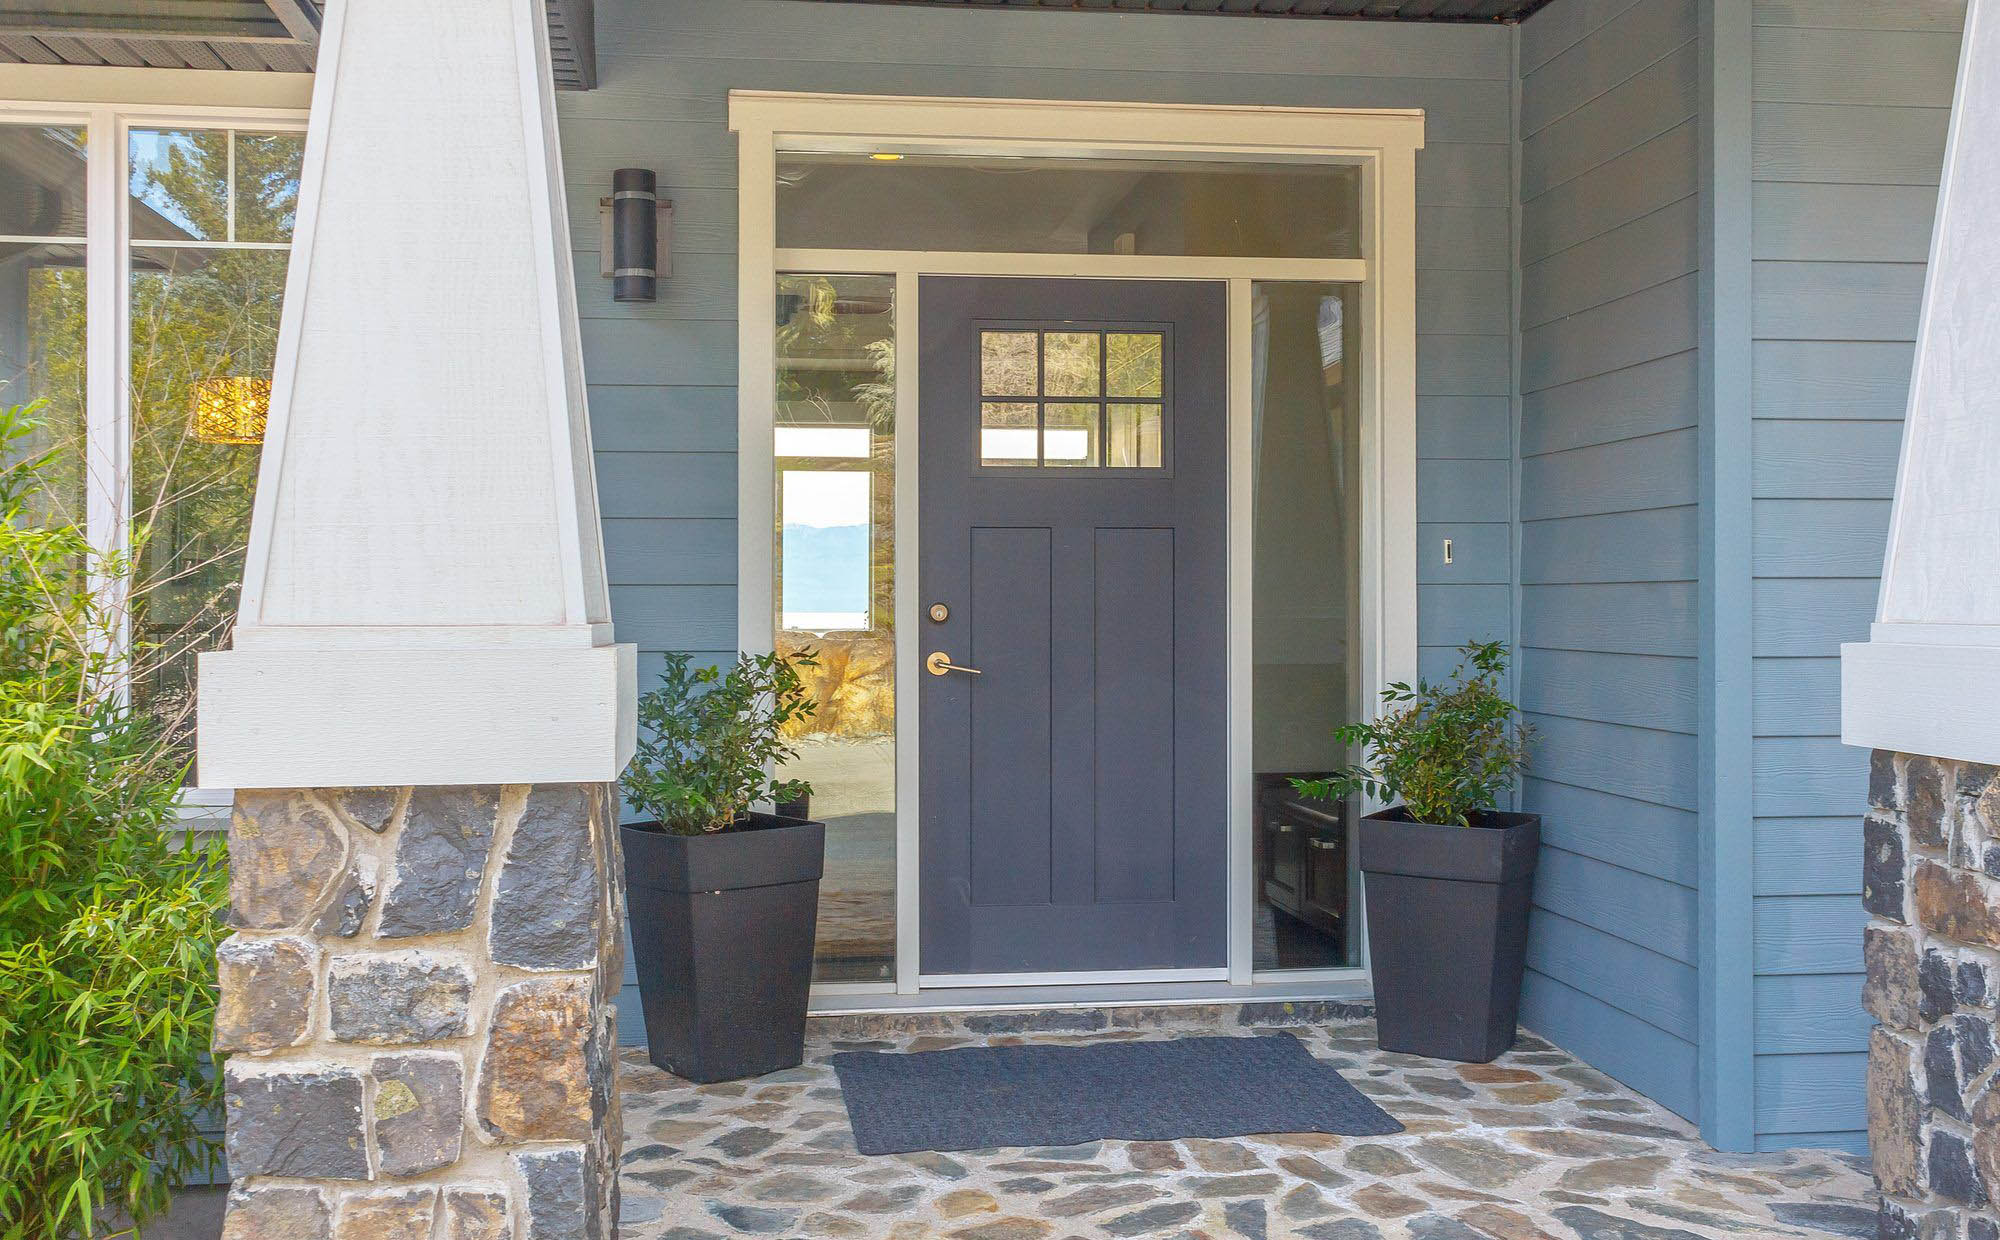 front porch design ideas, blue color scheme, blue siding and front door with dark blue planters, stone columns